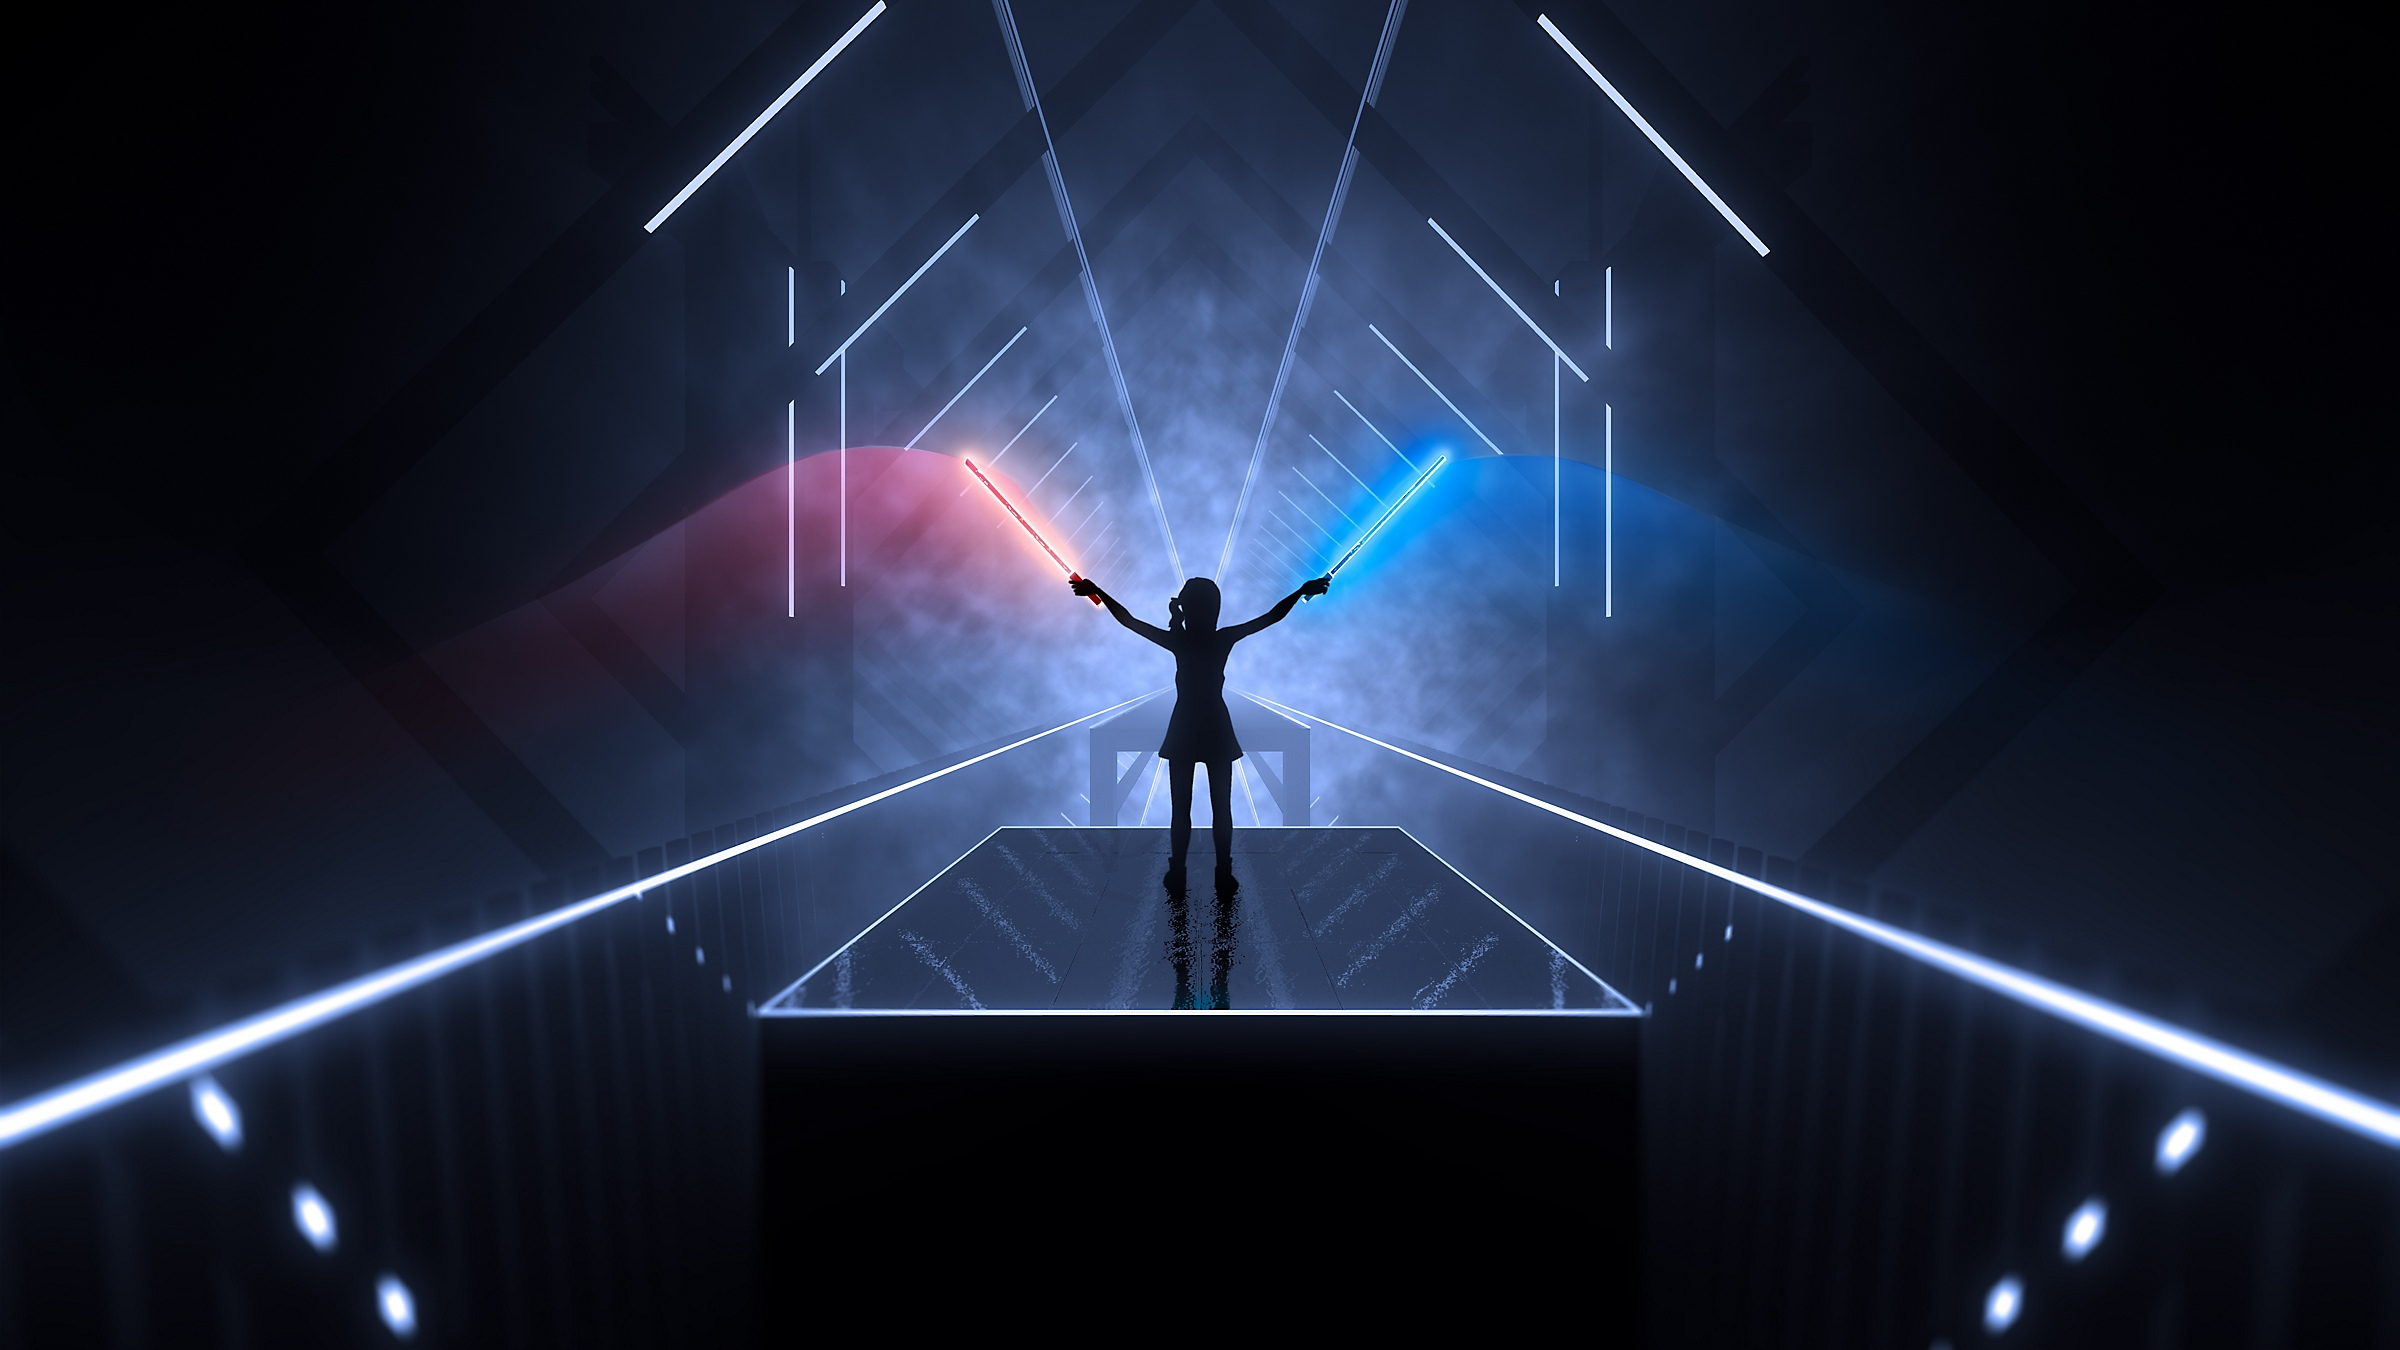 https://gmedia.playstation.com/is/image/SIEPDC/beat-saber-screen-06-ps4-en-27nov18?$2400px$